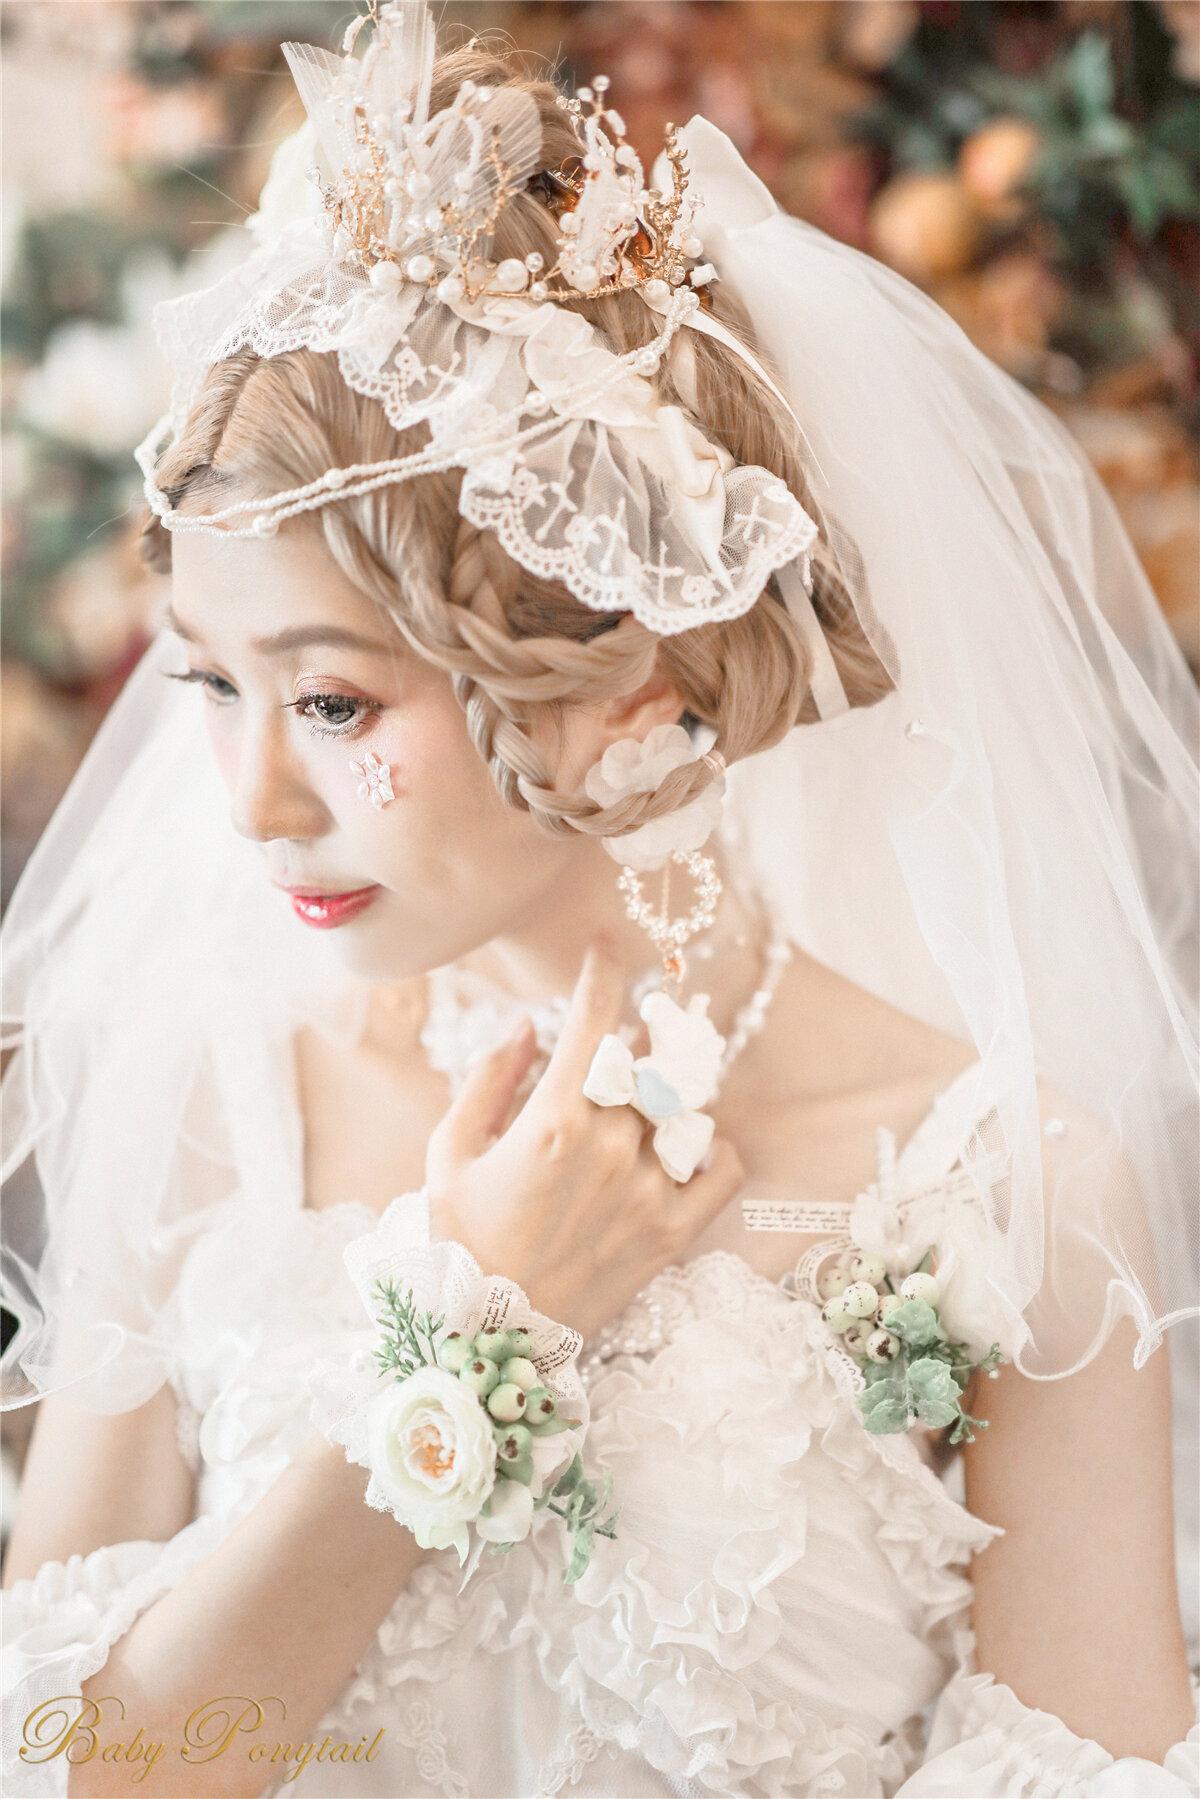 Babyponytail_Heavenly Teardrops_Model photo_JSK white_kaka_14.jpg